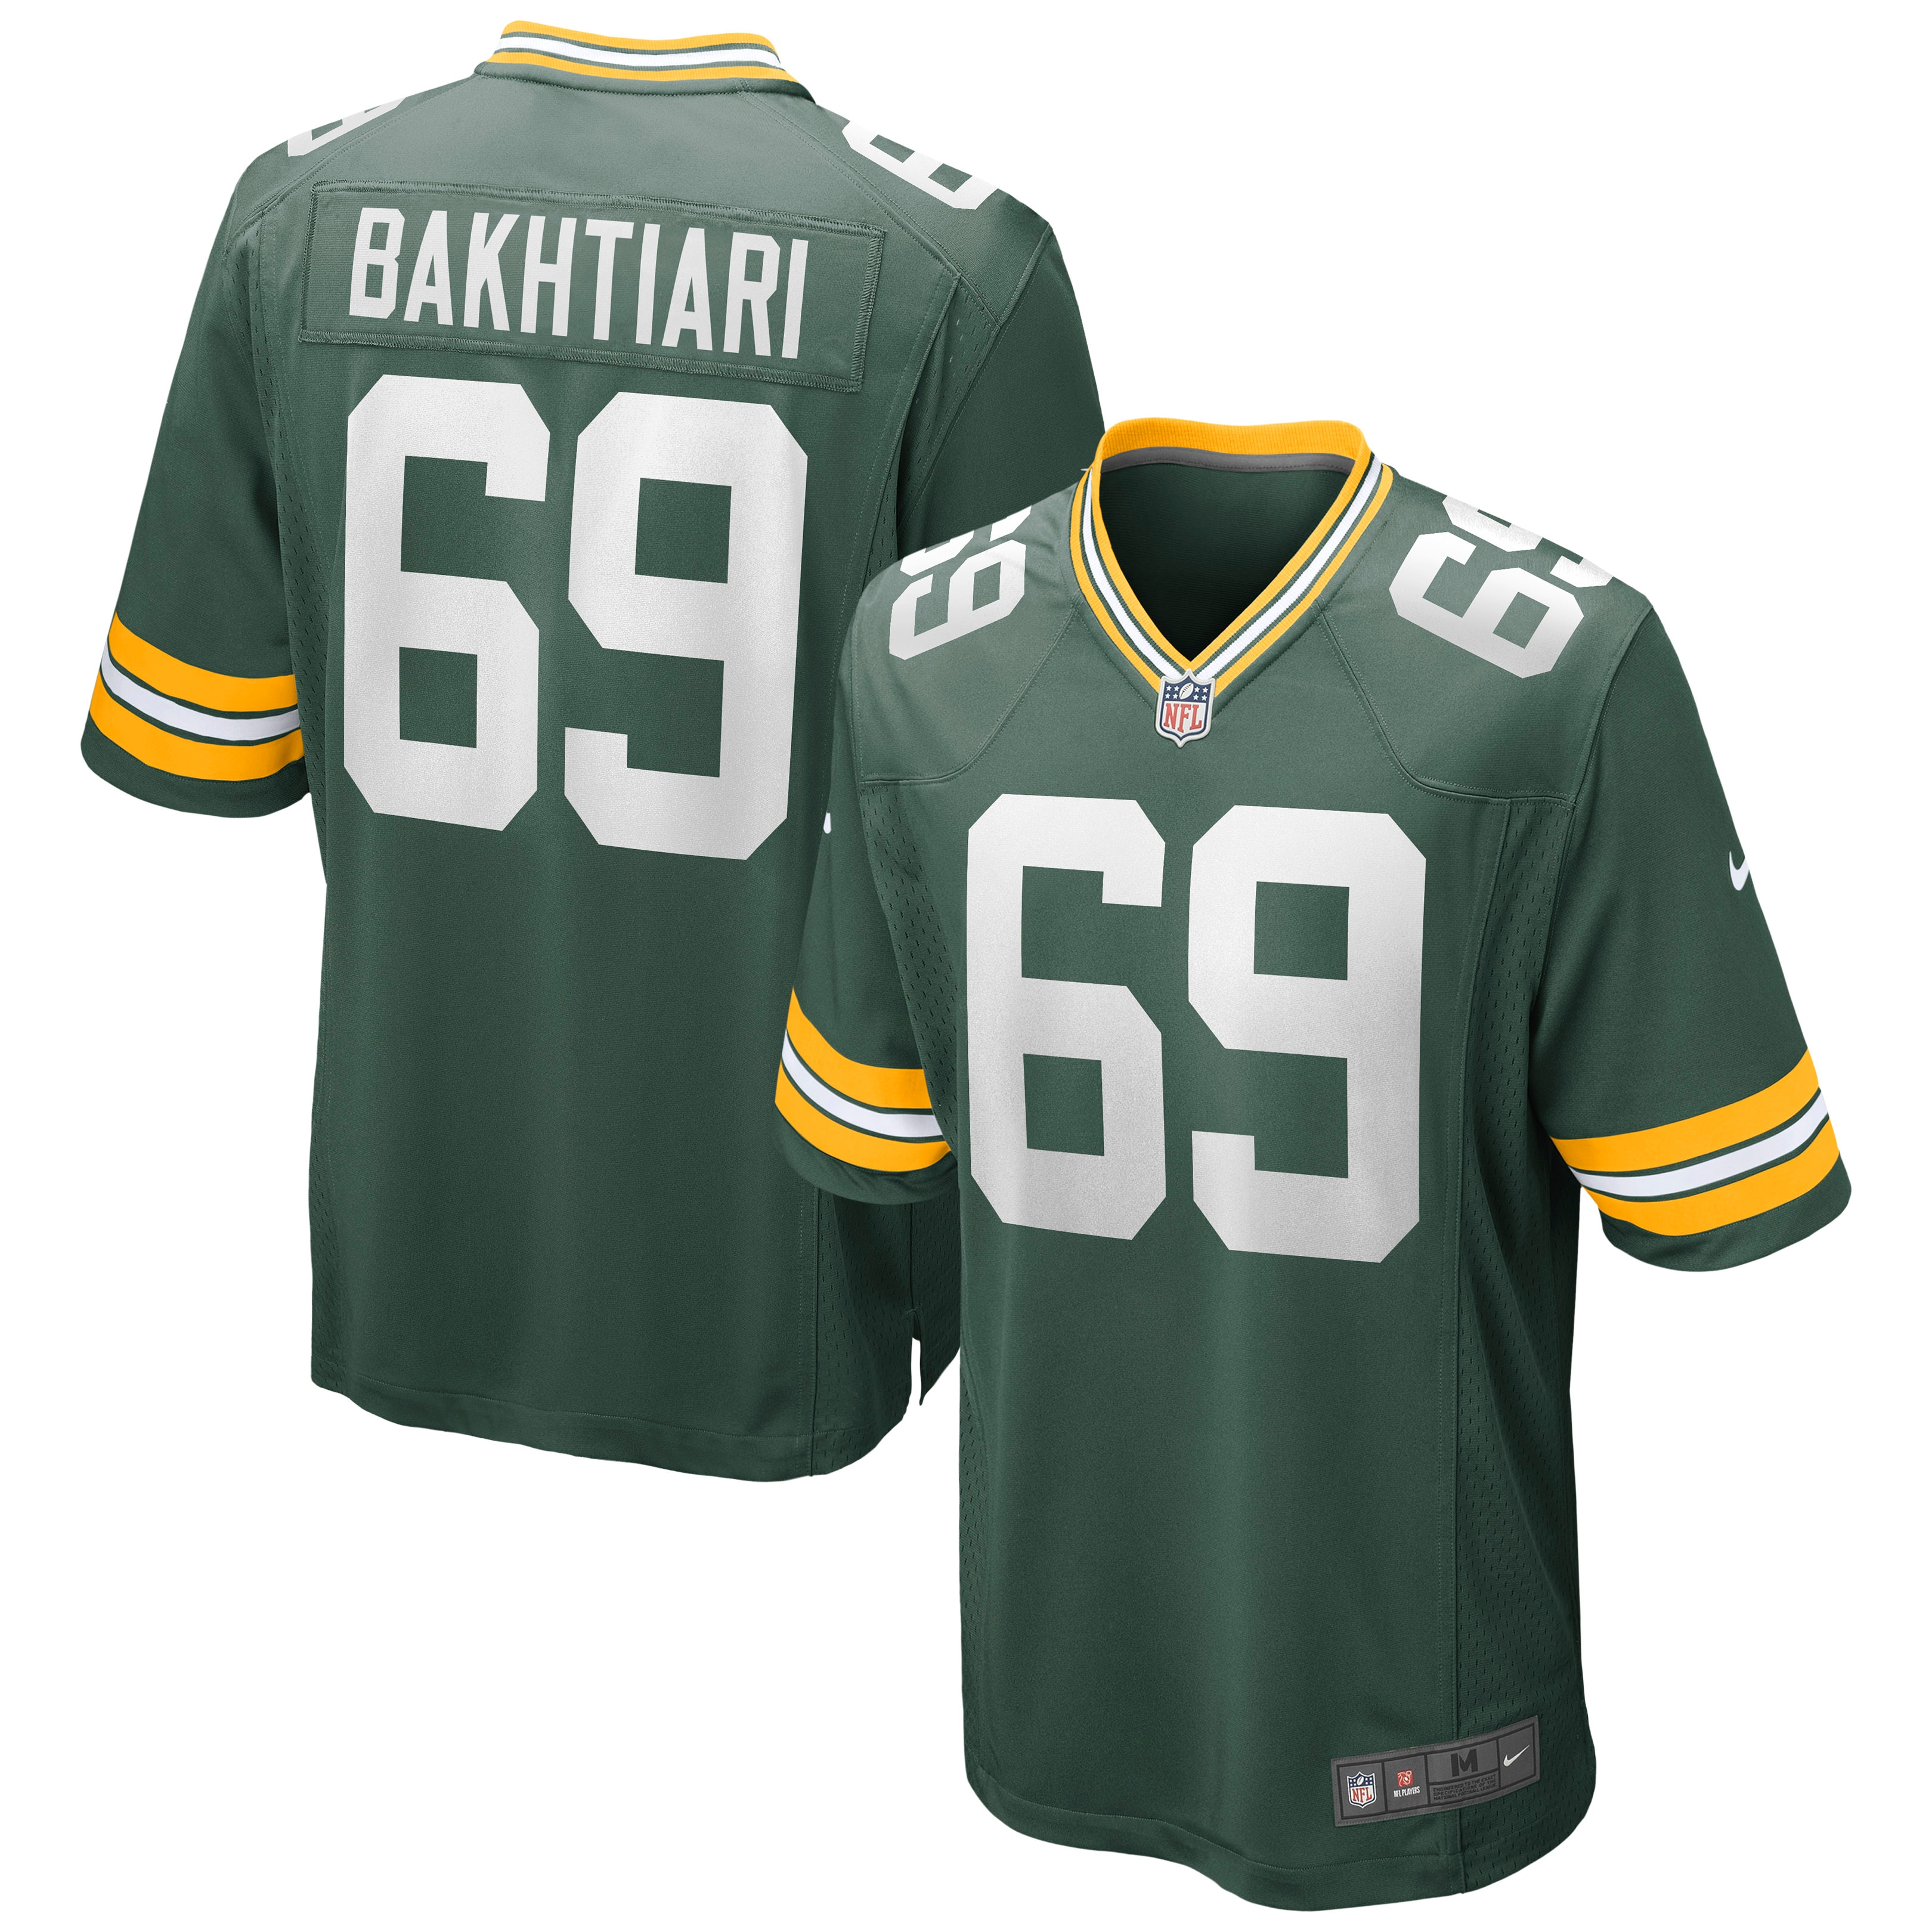 David Bakhtiari Green Bay Packers Nike Game Jersey - Green - Walmart.com